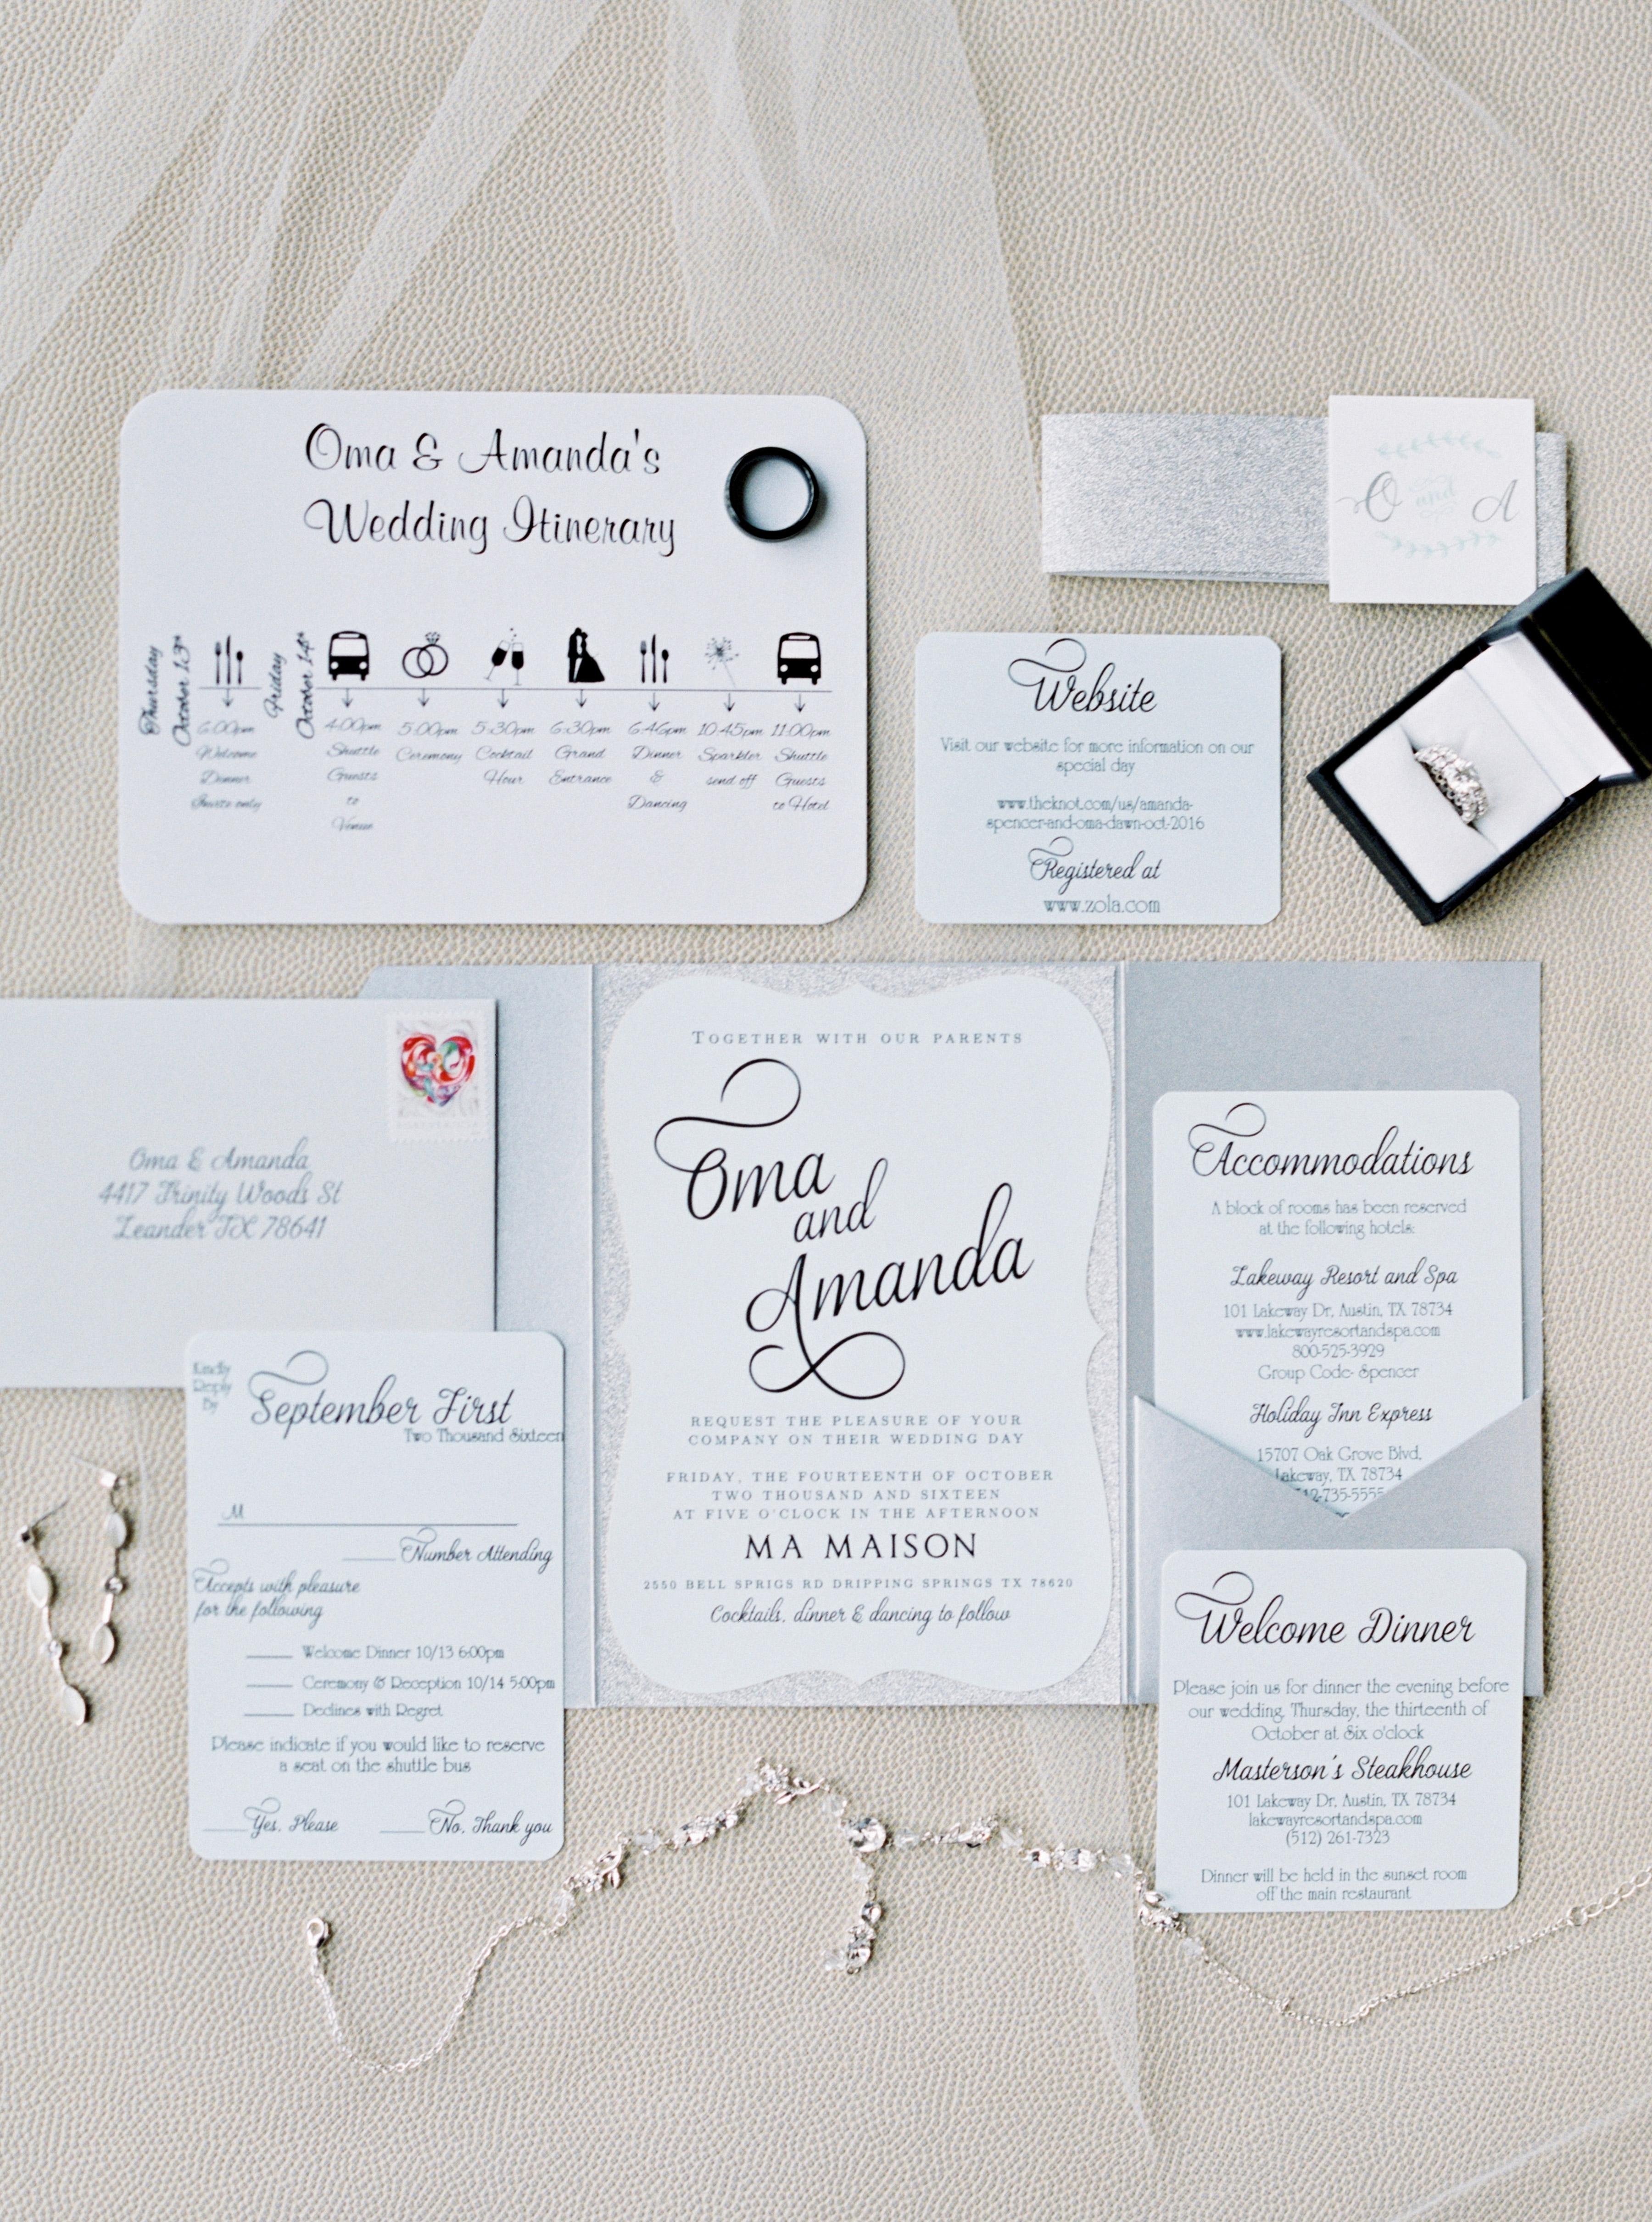 wedding invitations and stationery